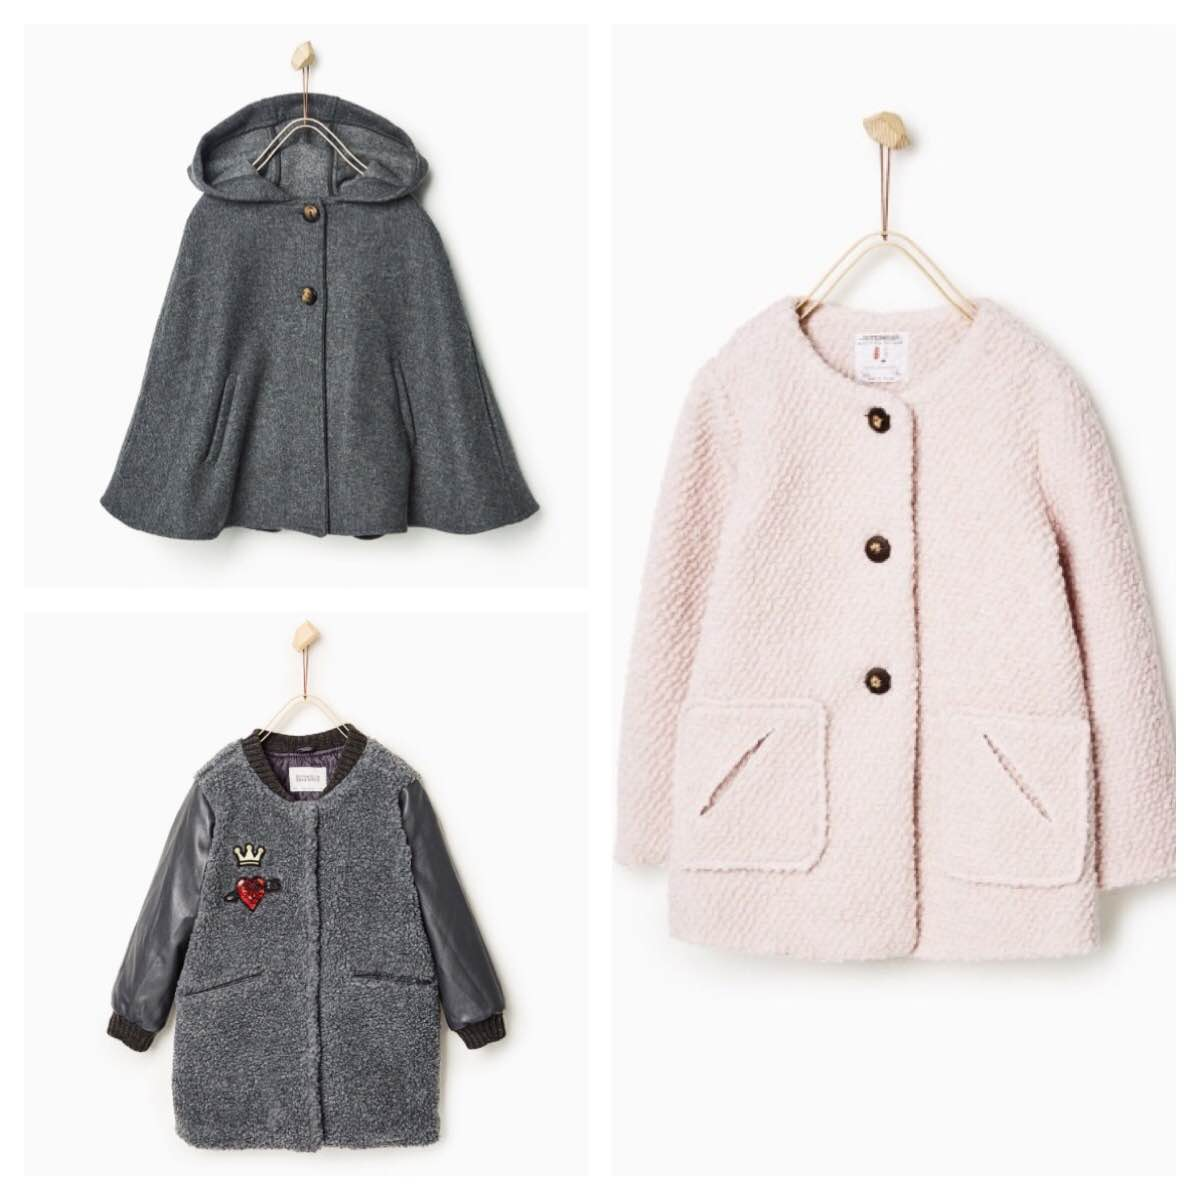 Clockwise: Gray Hooded Cape | Pink Knit Coat | Long fleecy bomber jacket | photos and jackets by  Zara